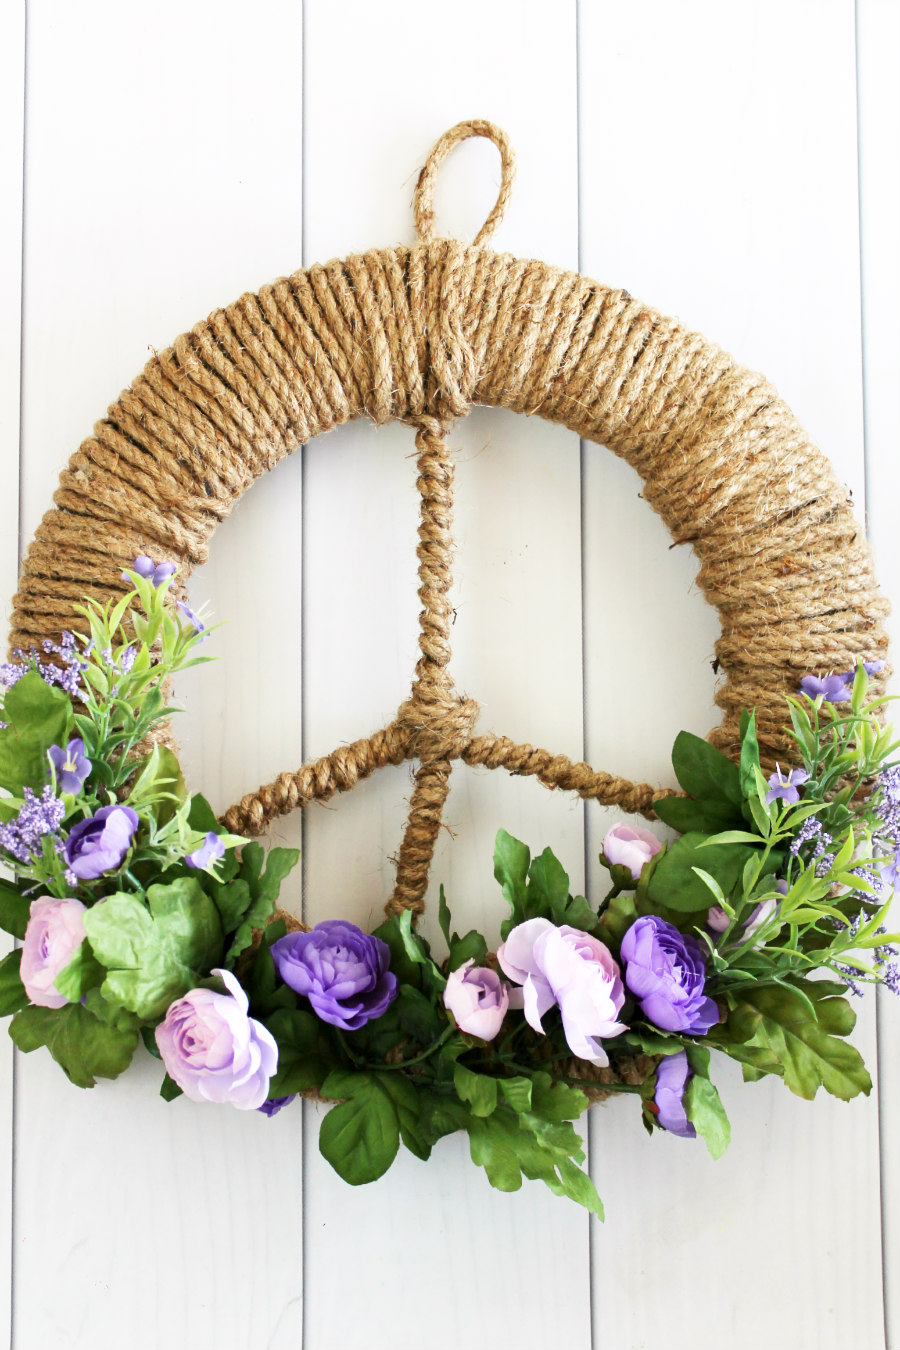 floral peace sign wreath